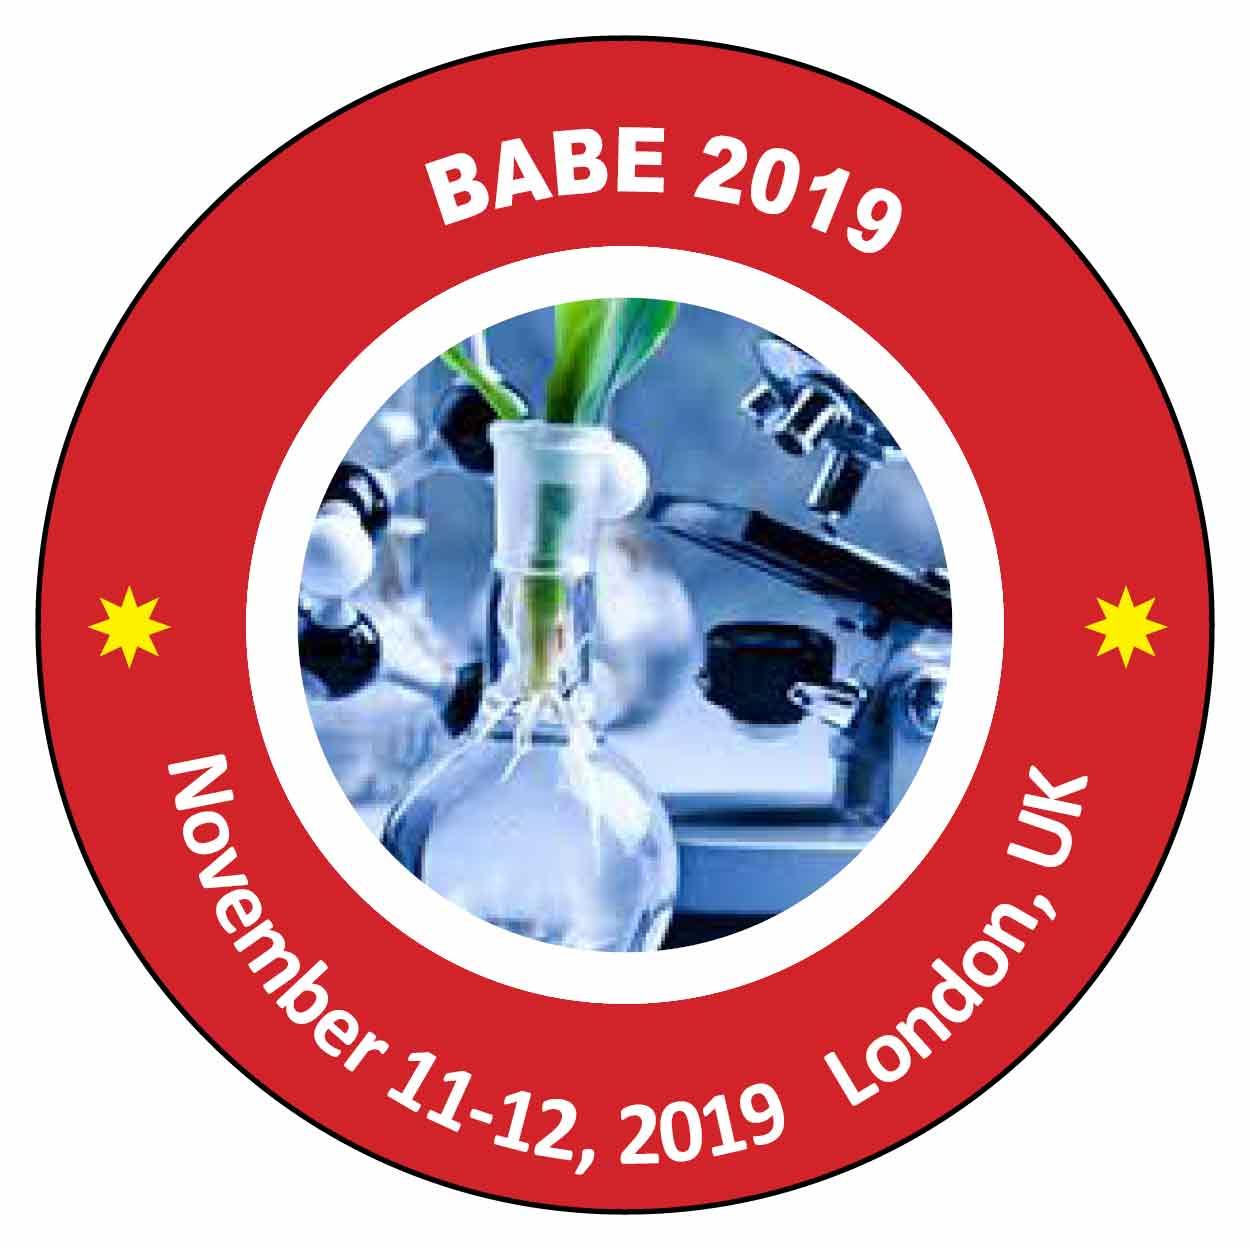 BABE Conference | Bioavailability Congress | Pharma